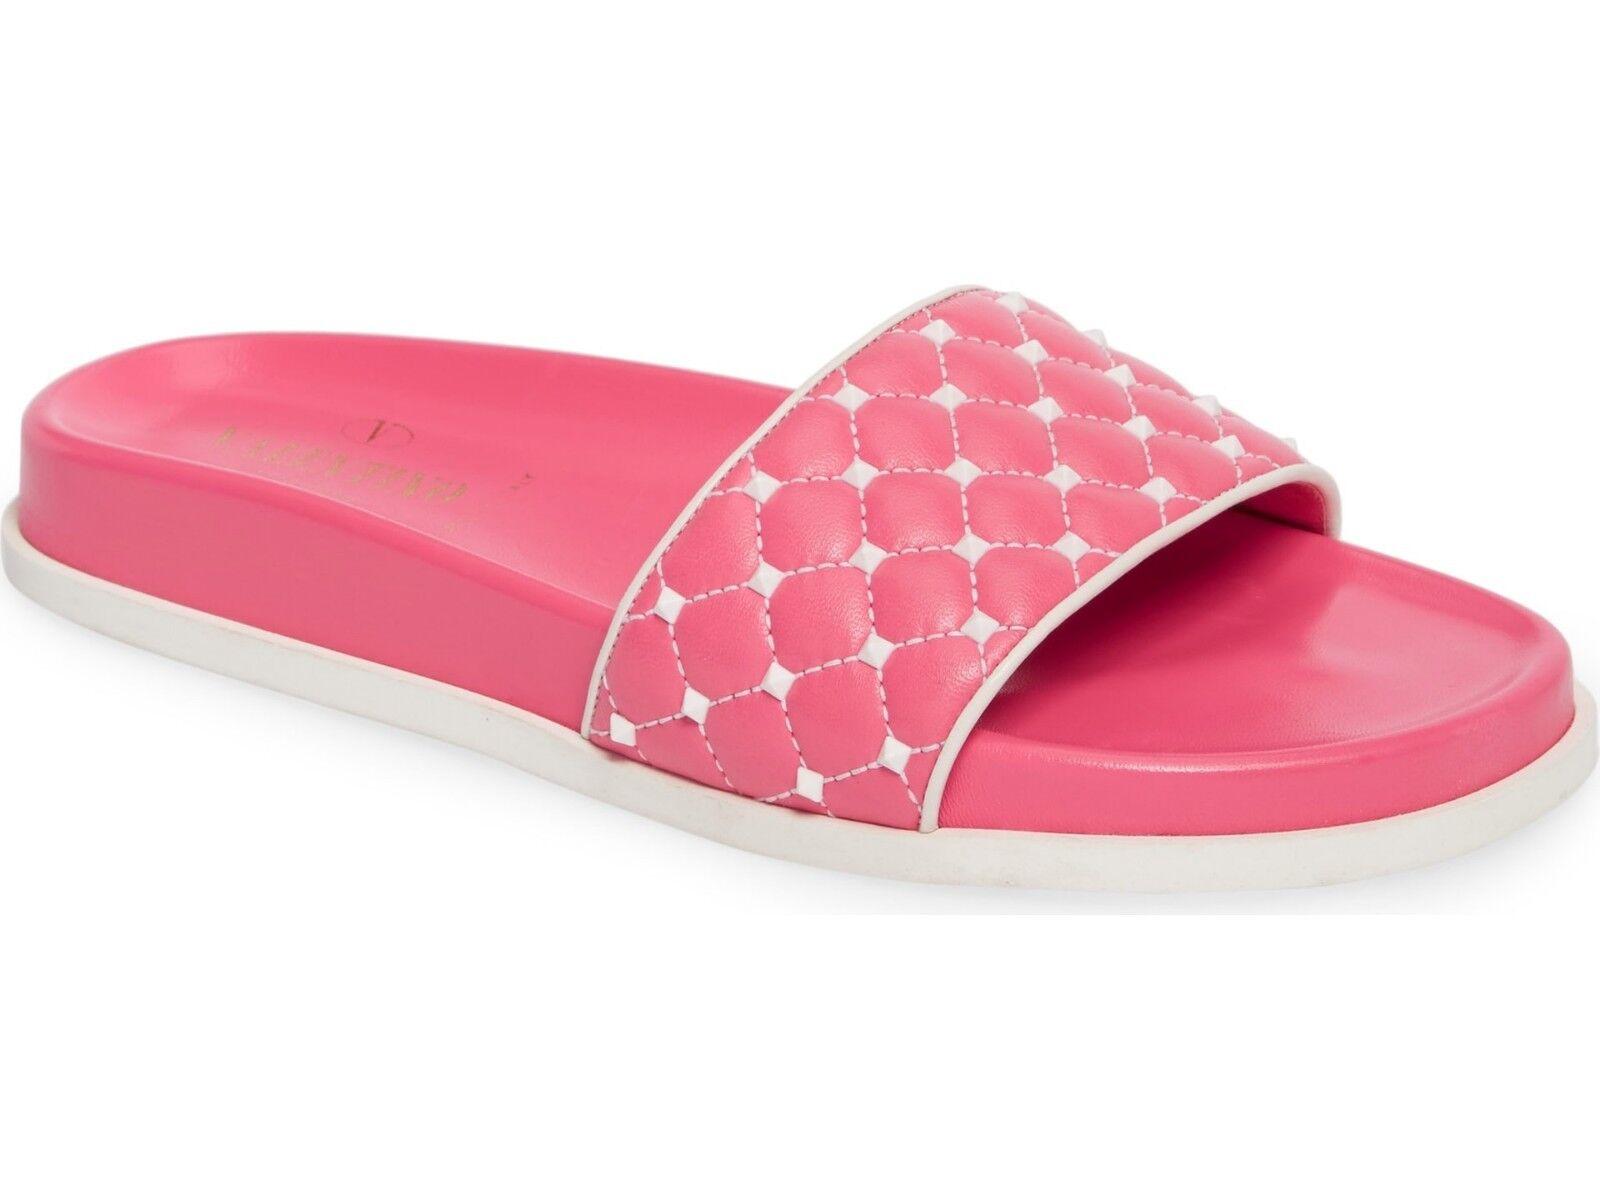 Valentino Garavani Rockstud Quilted Pool Slide Sandals Pink Mult Sz $725.00